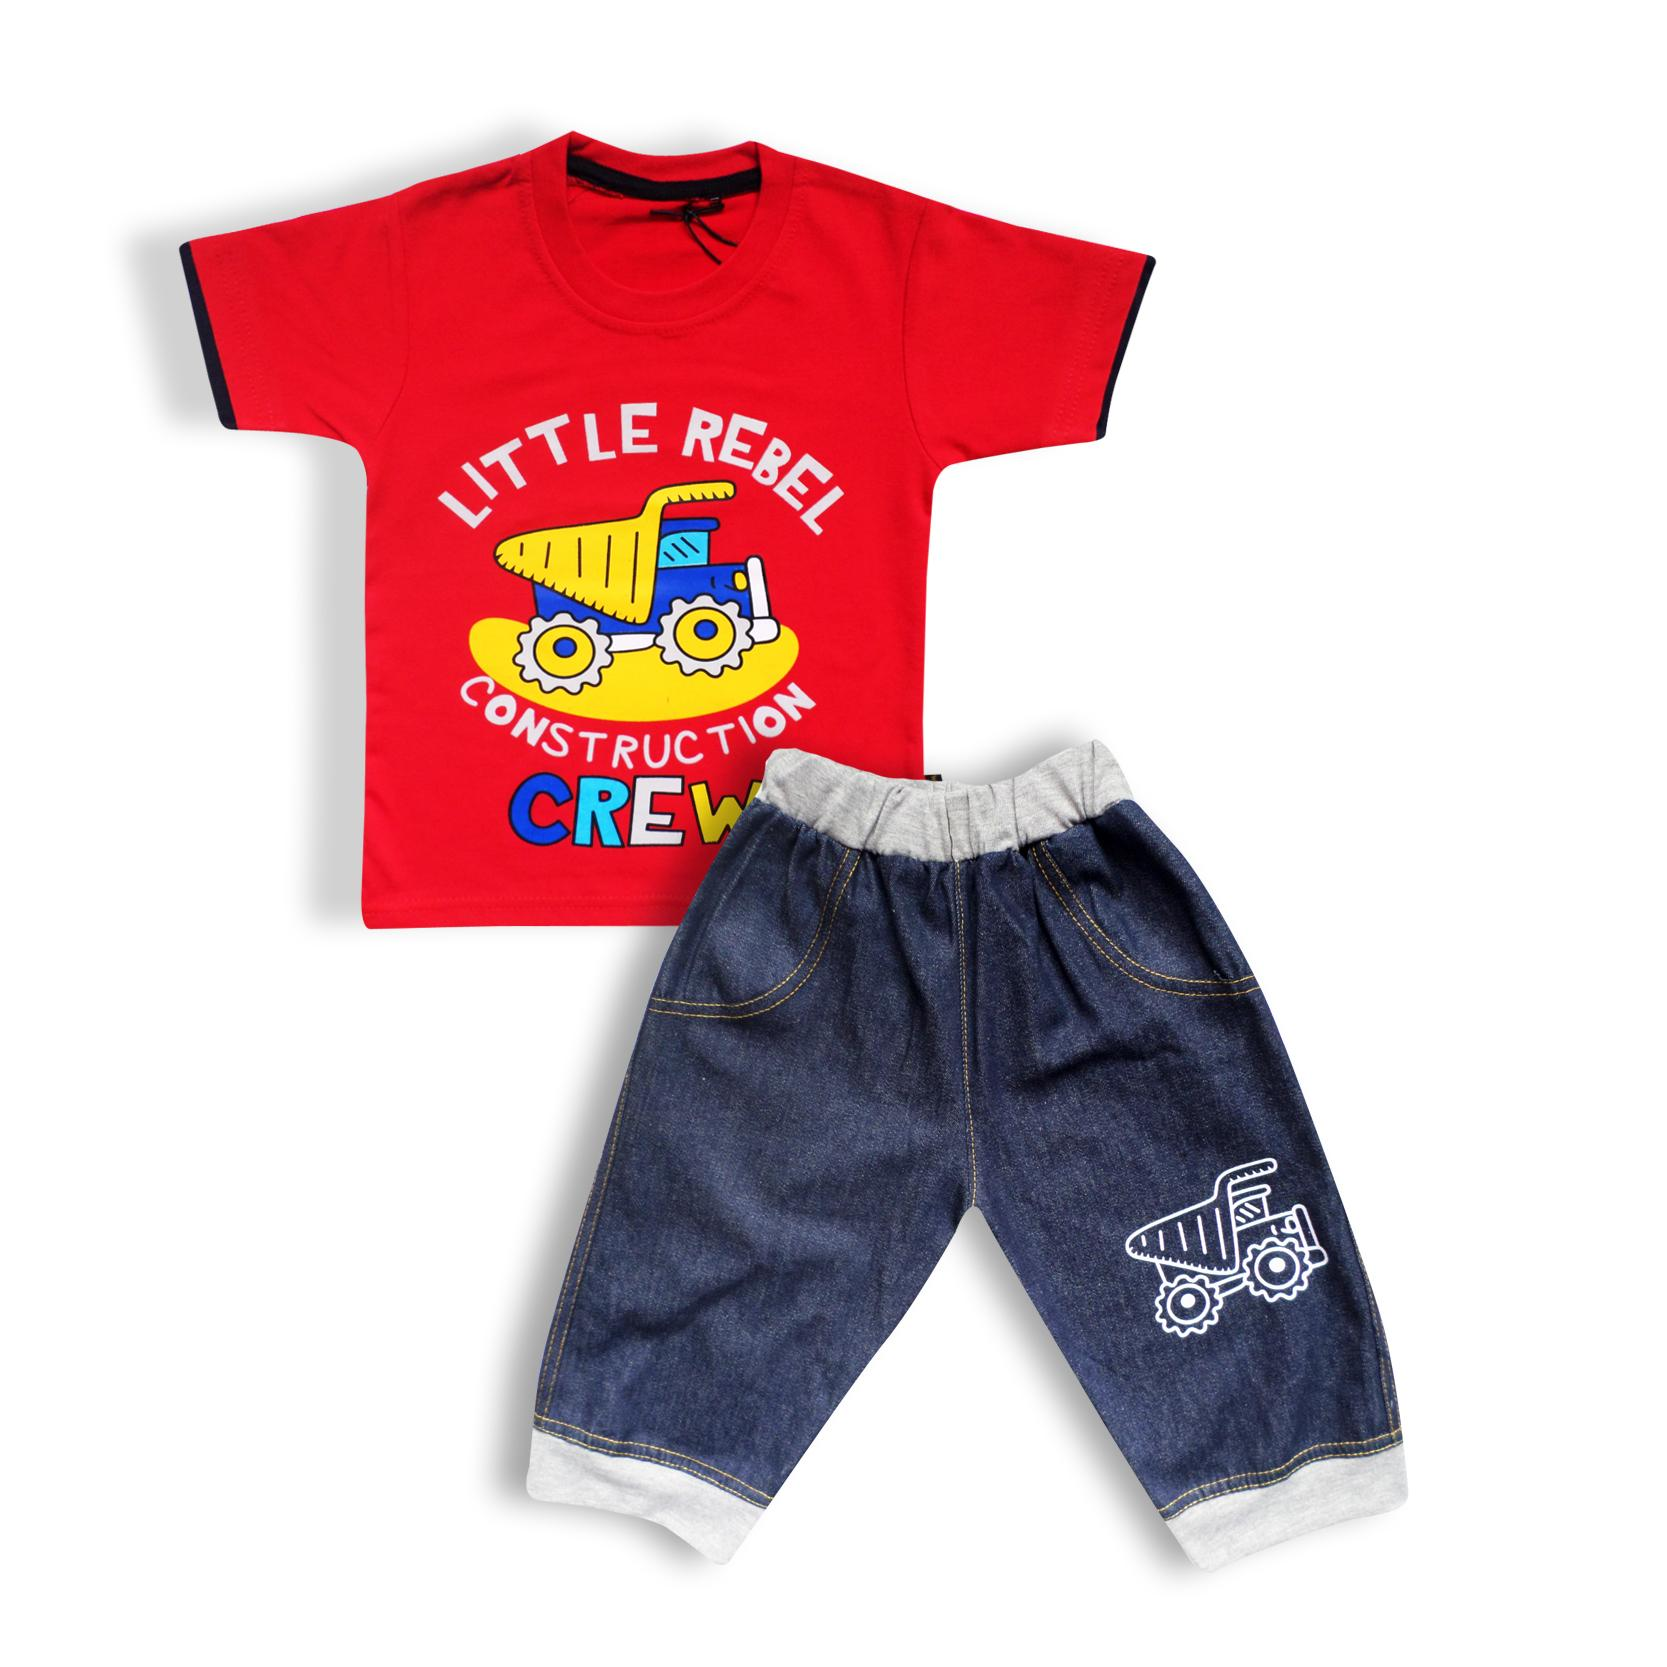 Waka Kids Pakaian Baju Anak Bayi Laki Oblong Tangan Pendek Stelan Jeans Celana Pendek 2621